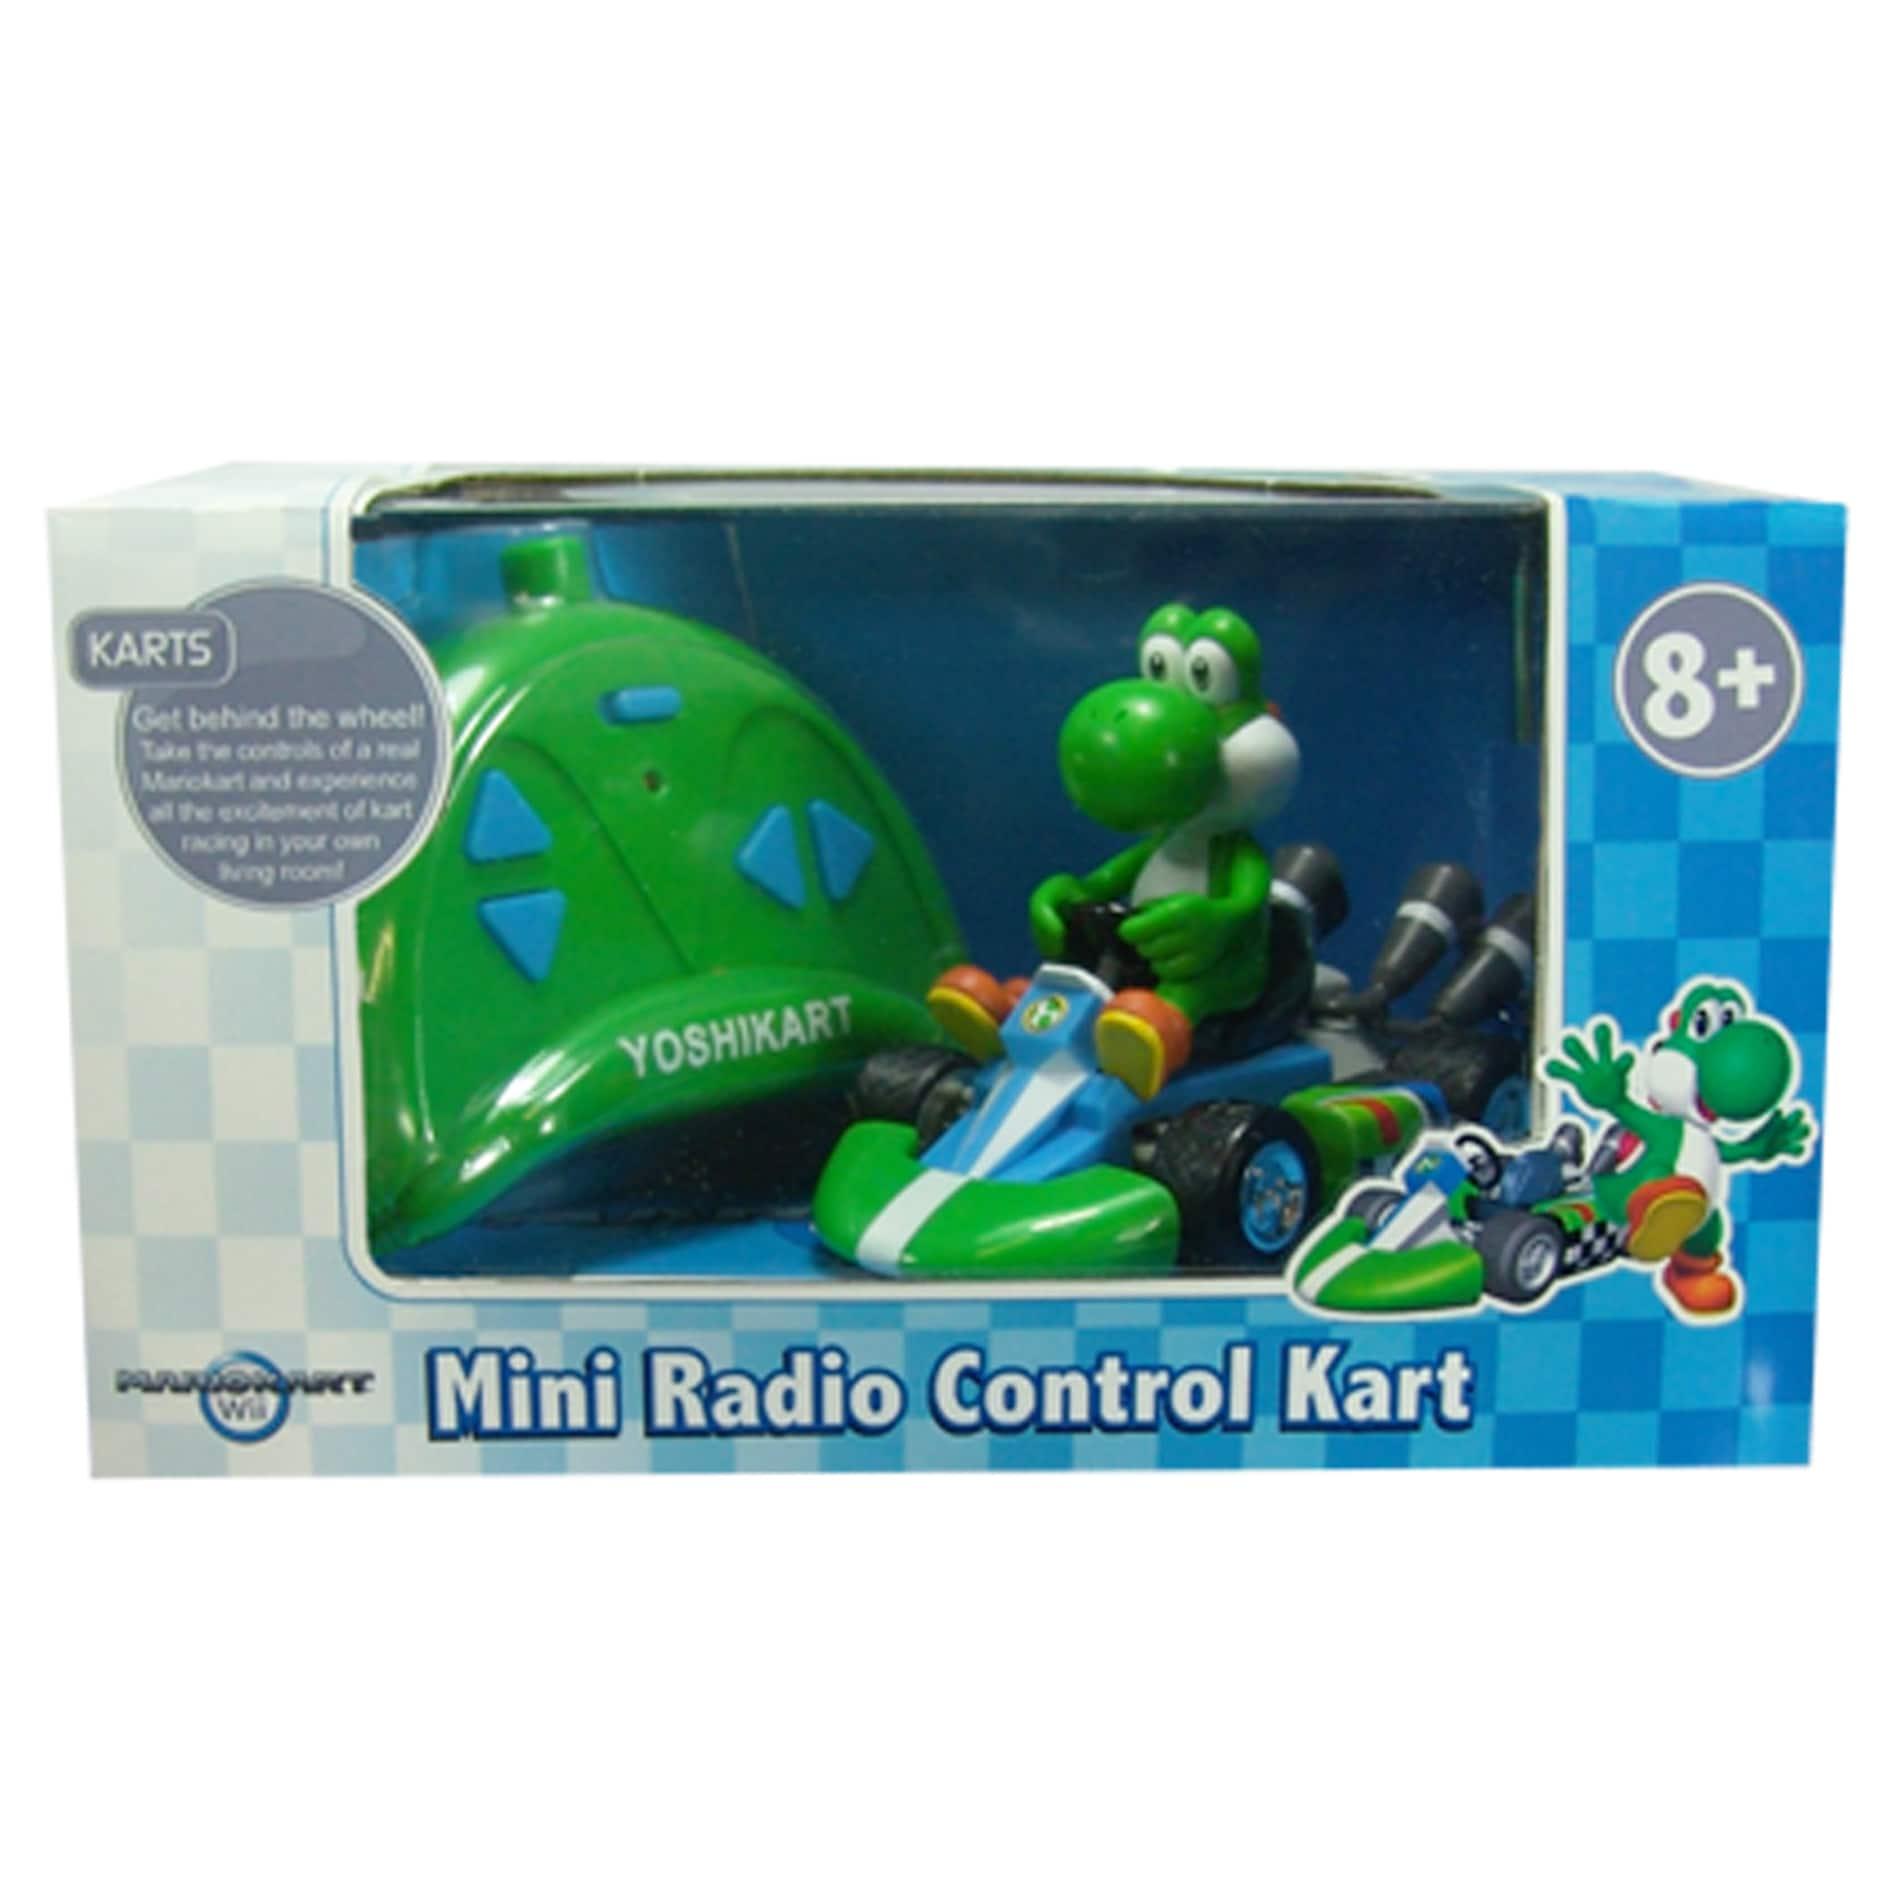 Super Mario Remote Control Car Reviews